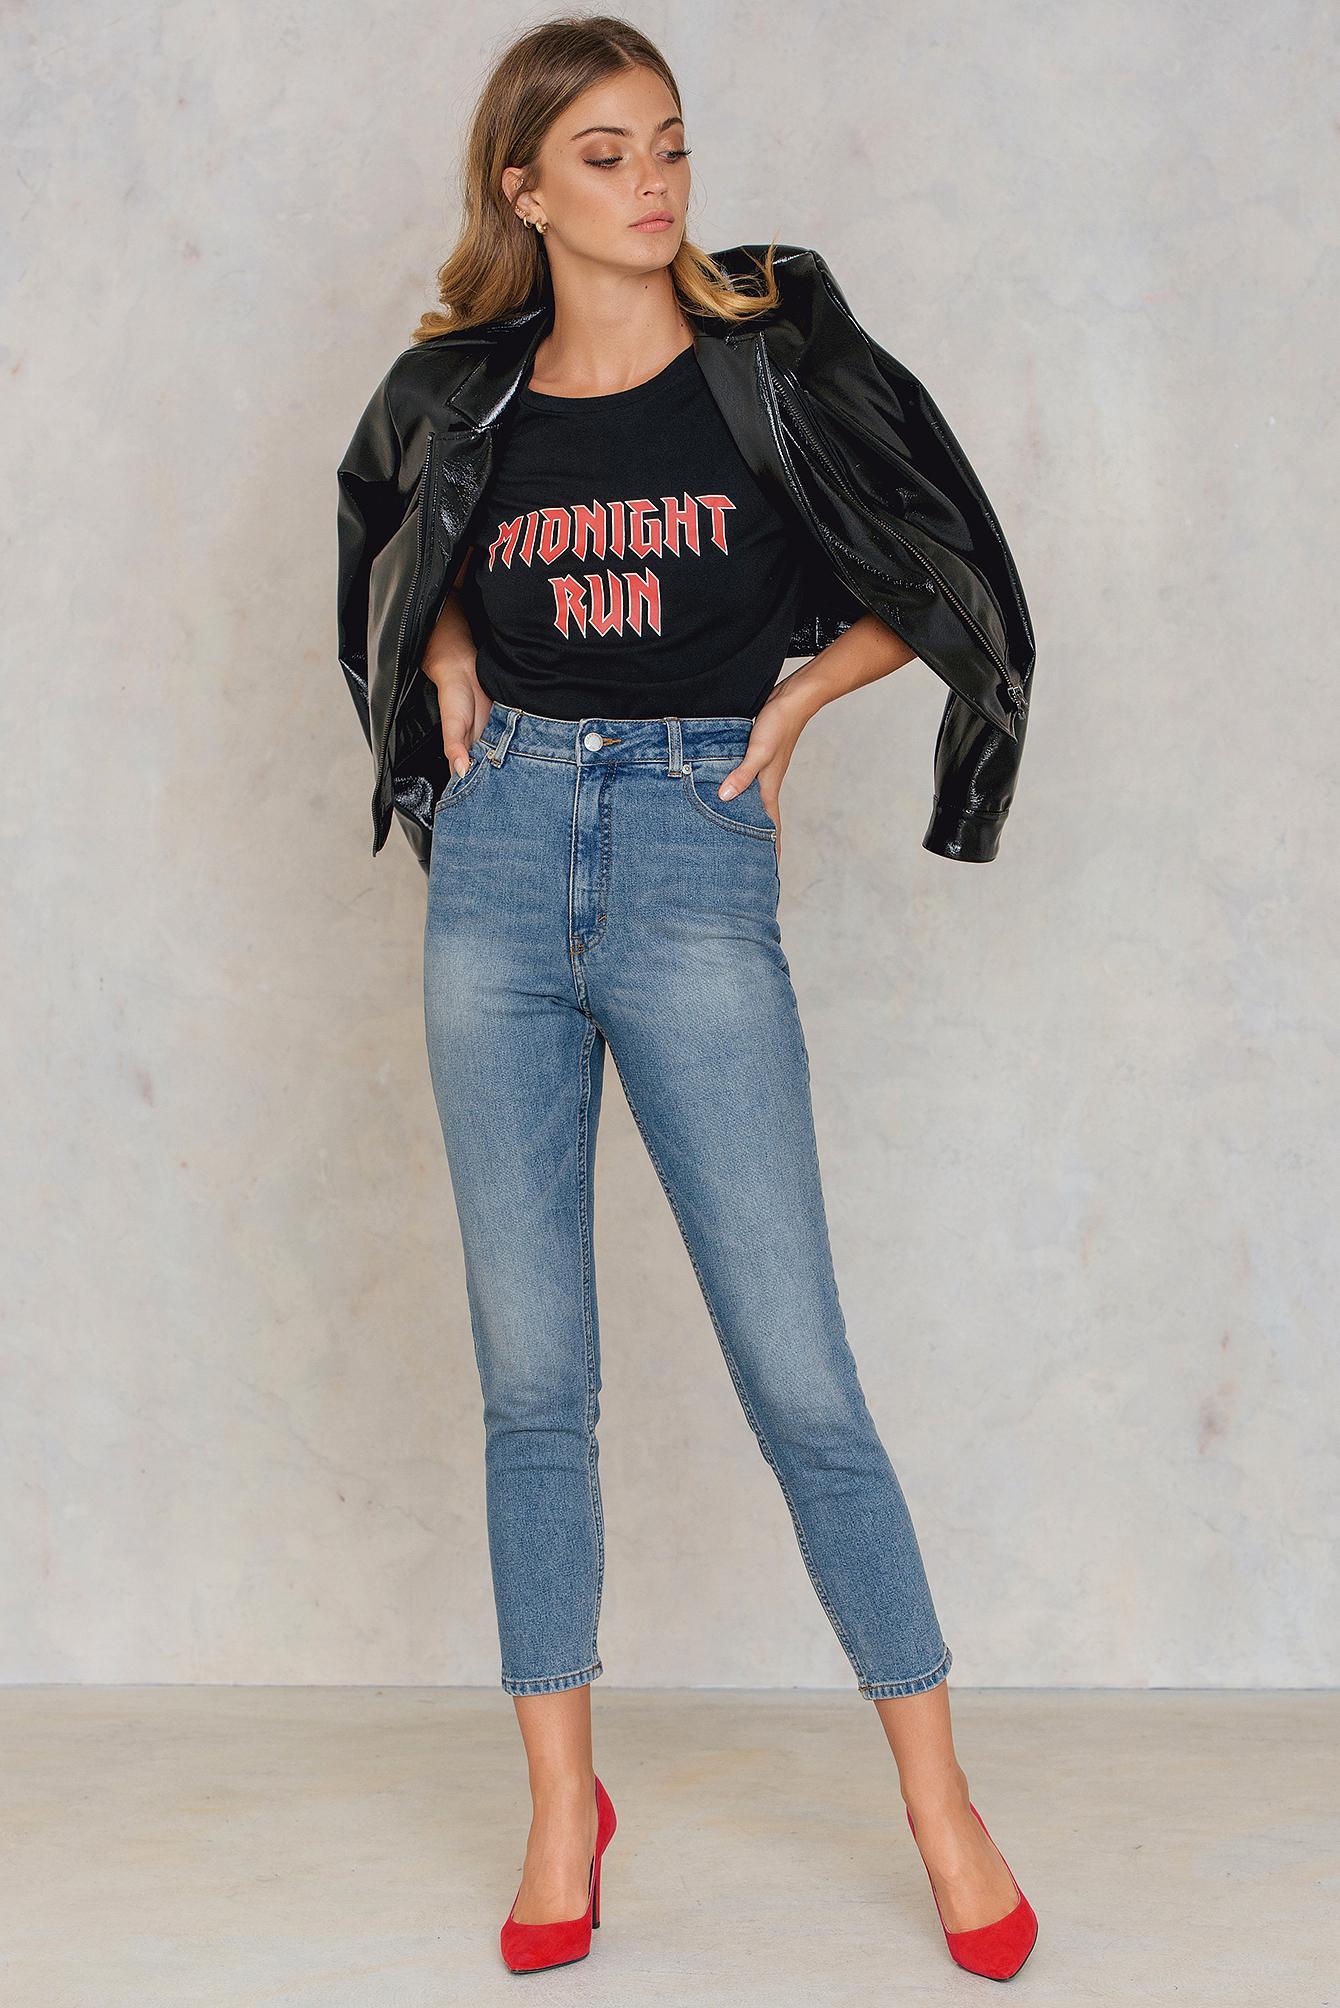 cheap monday donna jeans review